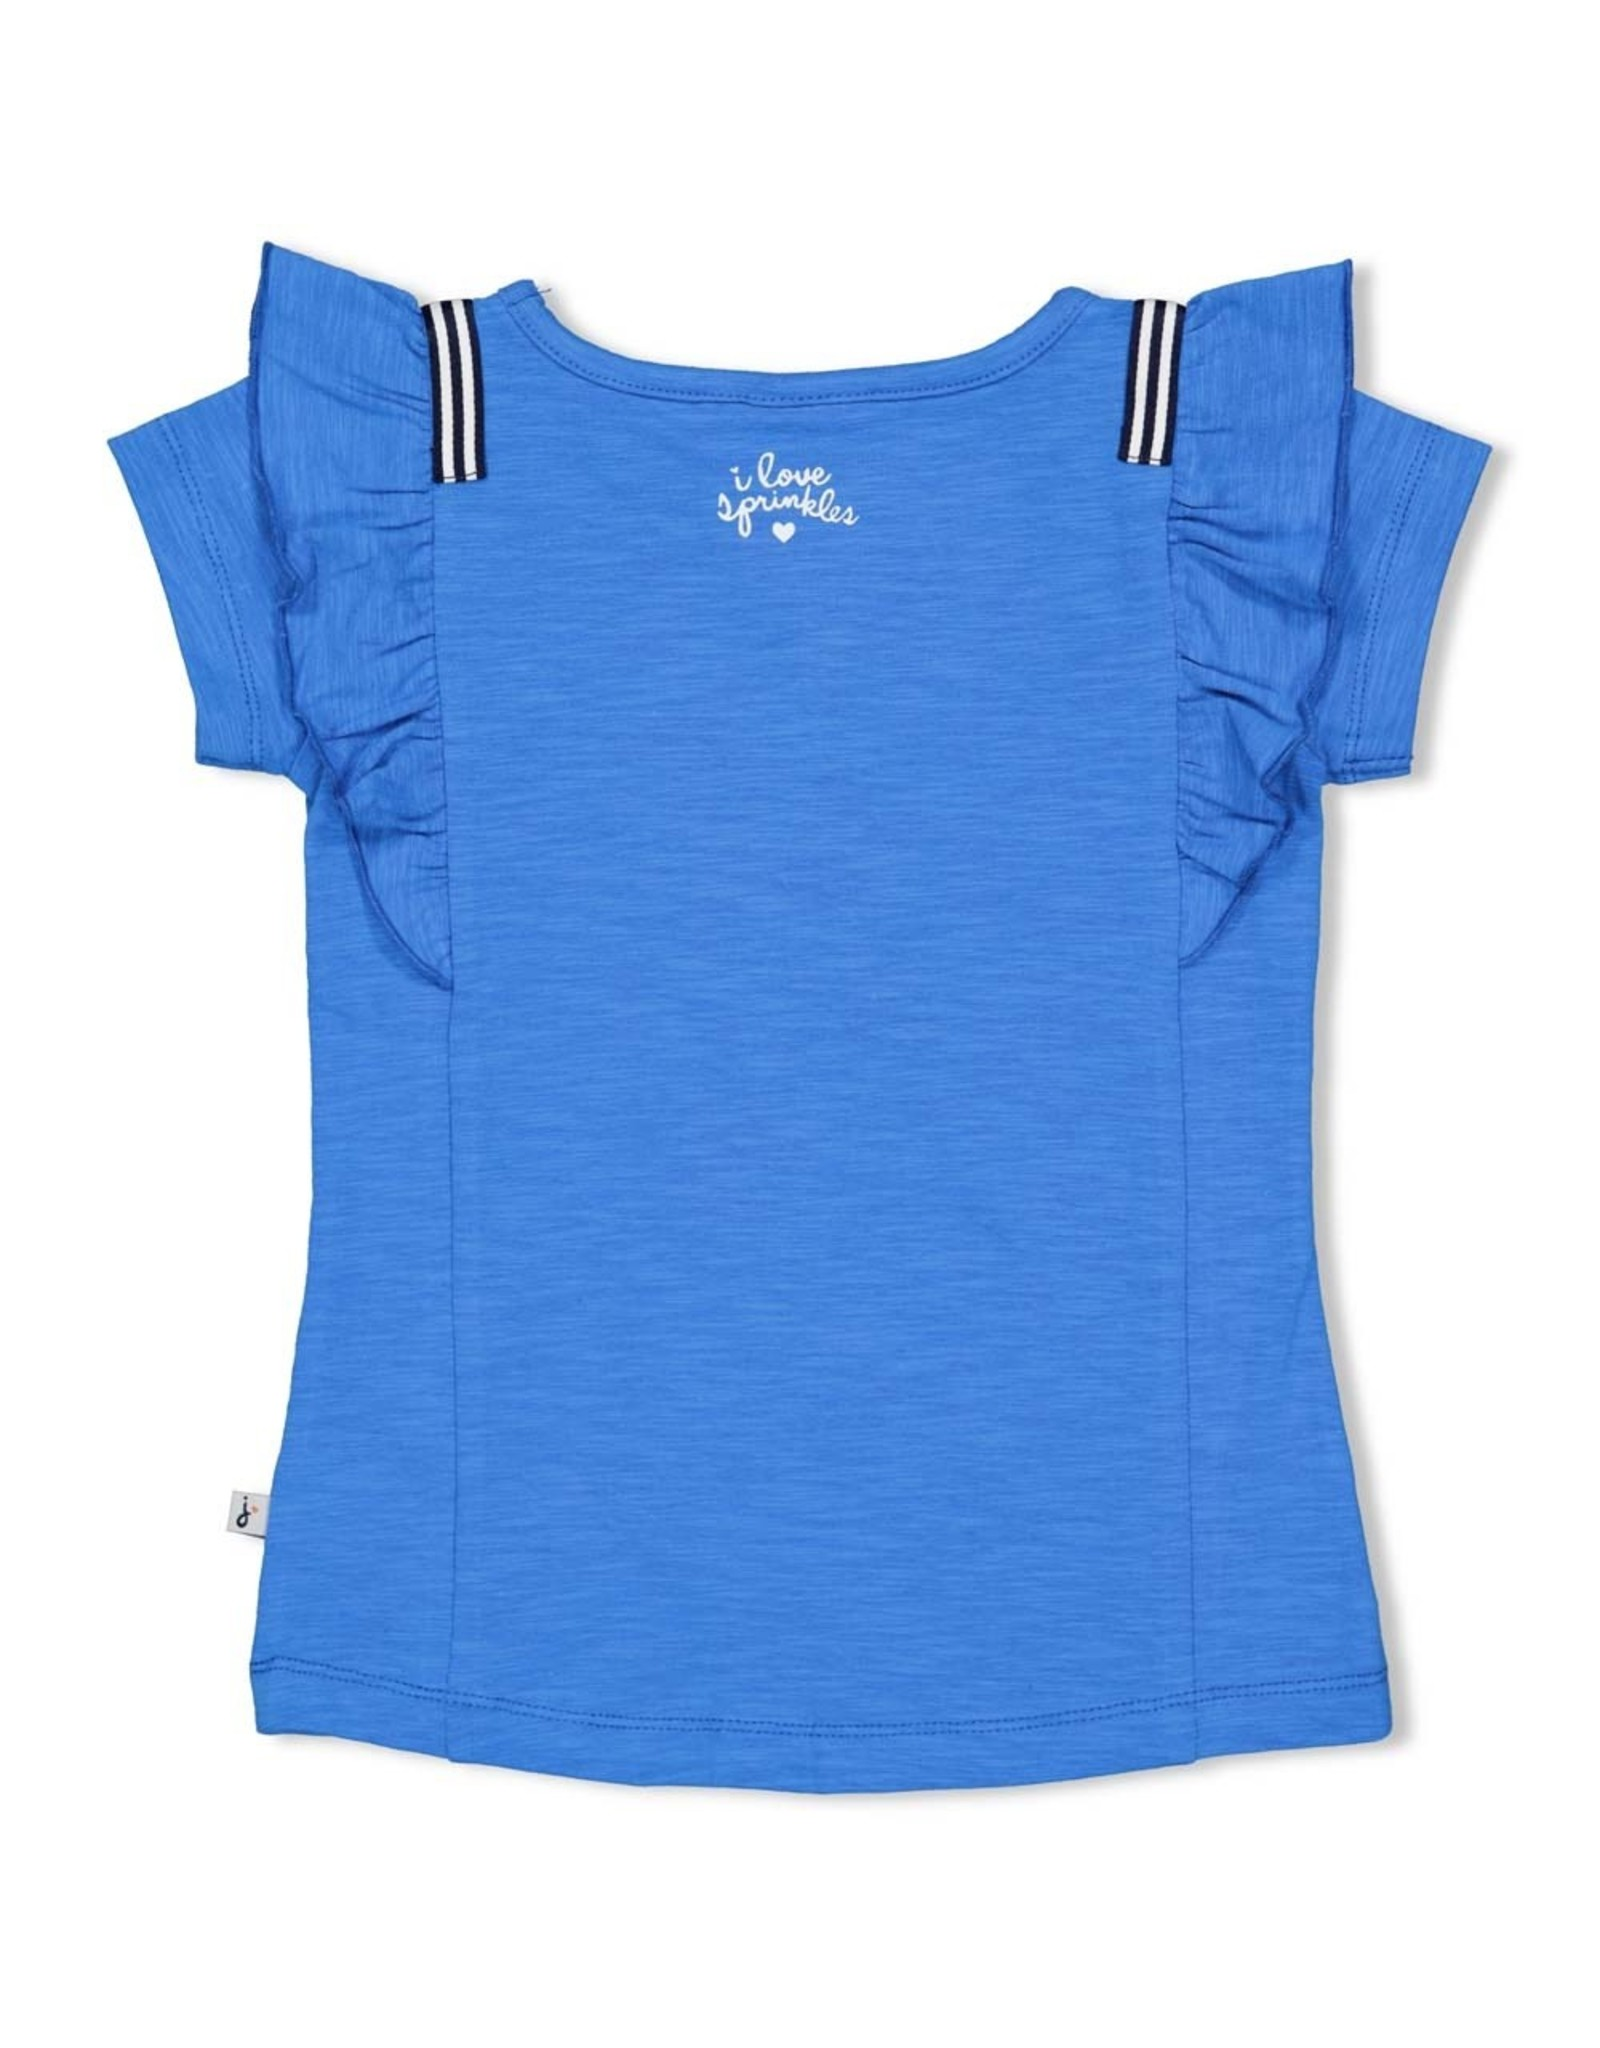 Jubel T-shirt - Sweet Gelato. Blauw